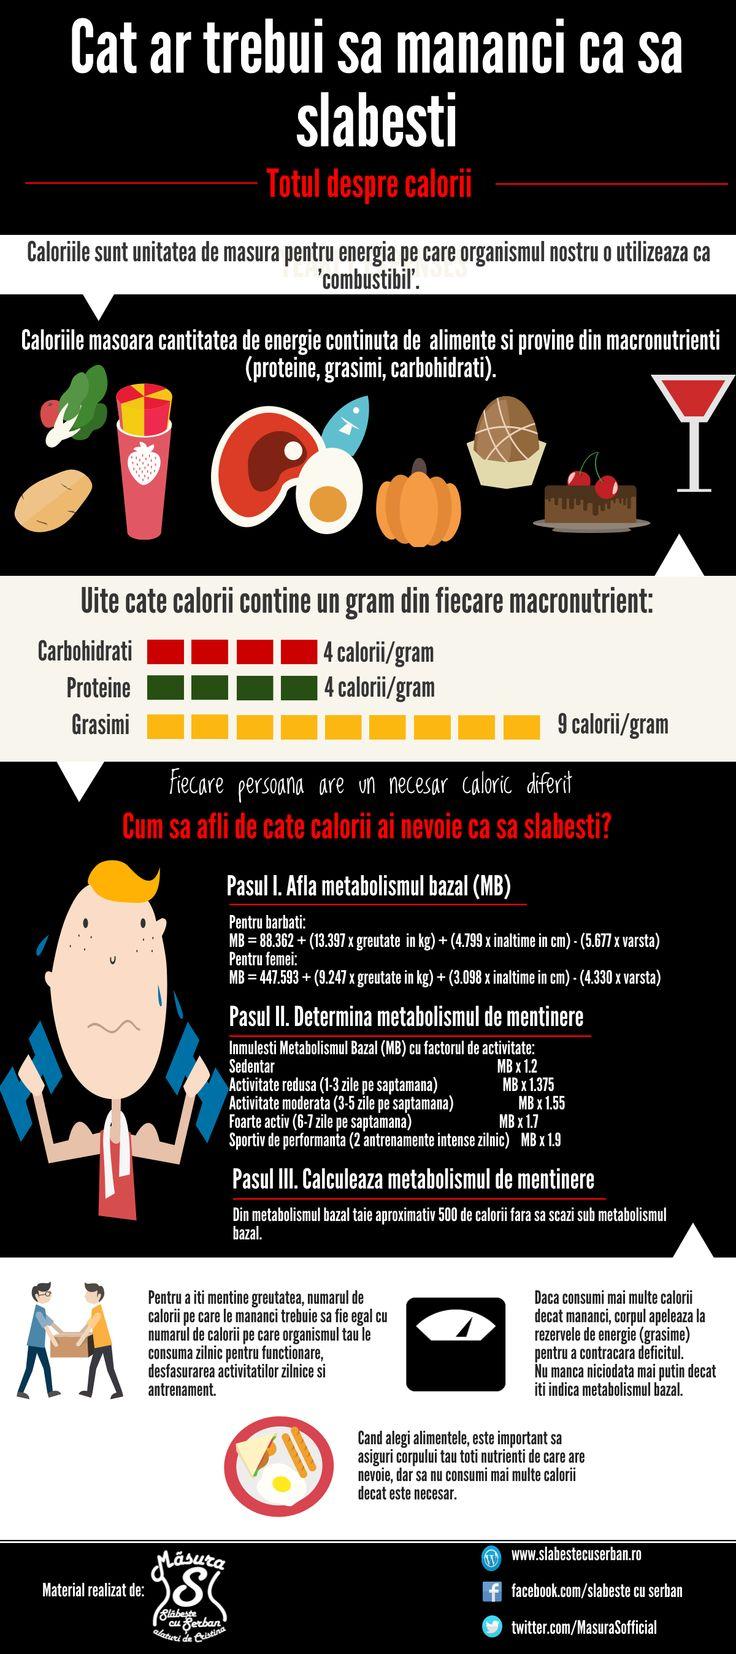 Cat trebuie sa mananci ca sa slabesti: Totul despre calorii